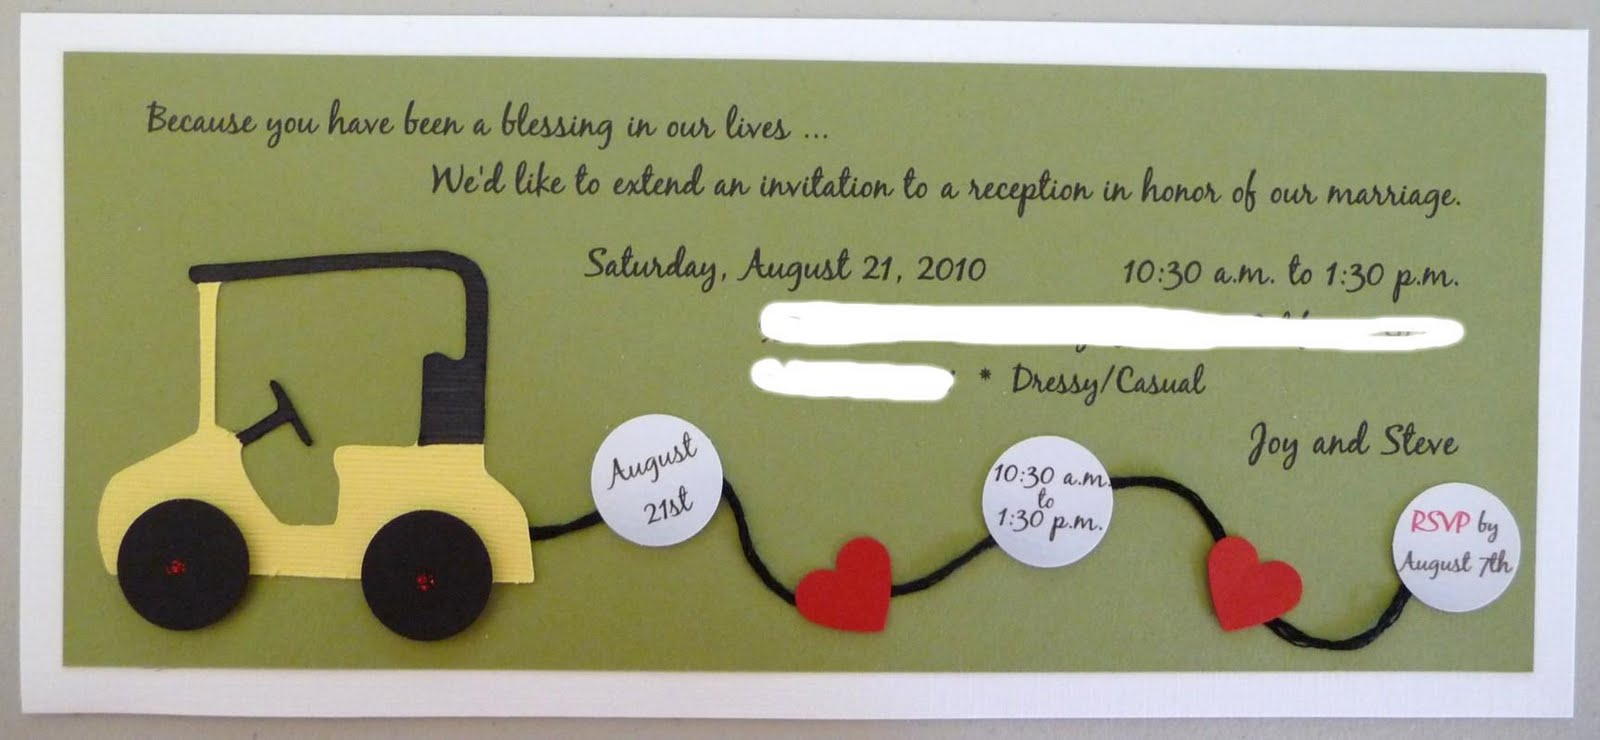 Wedding Invitations For Joy And Steve 2010